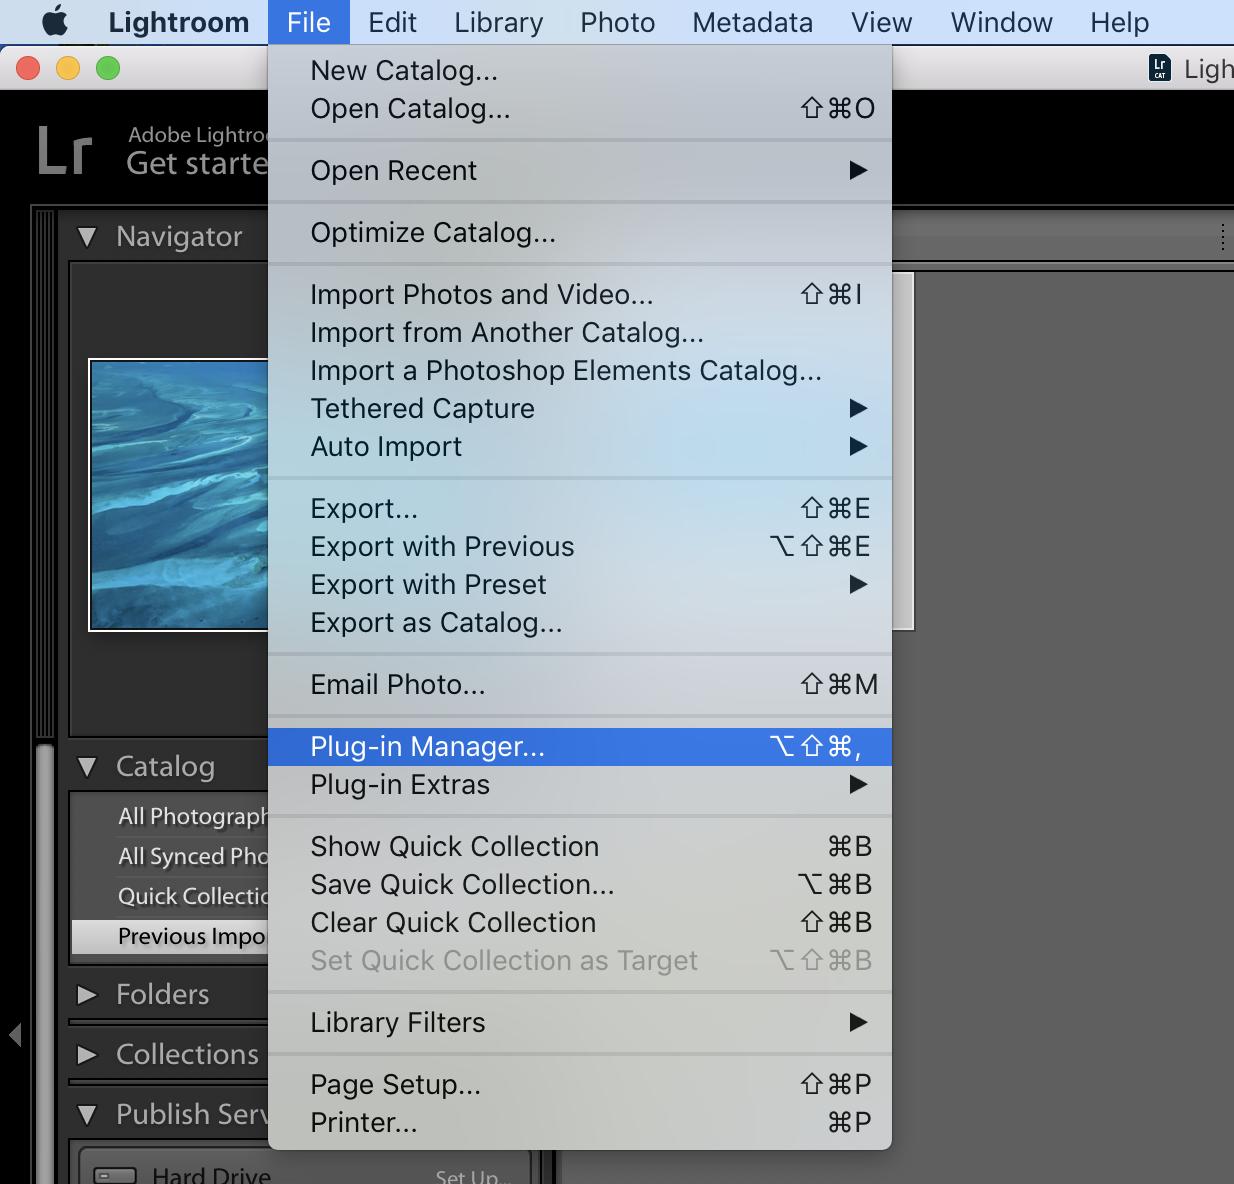 PhotoShelter's Official Adobe Lightroom Plug-in – PhotoShelter